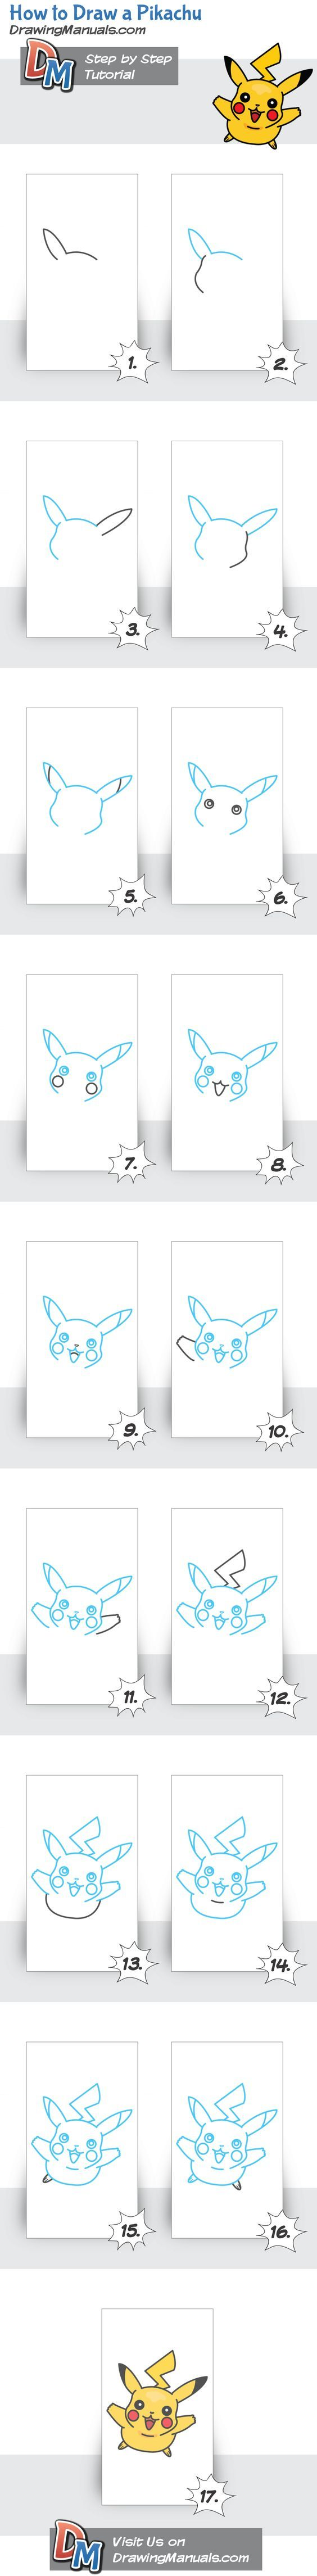 How to Draw Pikachu http://drawingmanuals.com/manual/how-to-draw-a-pikachu/ #drawing #tutorials #: